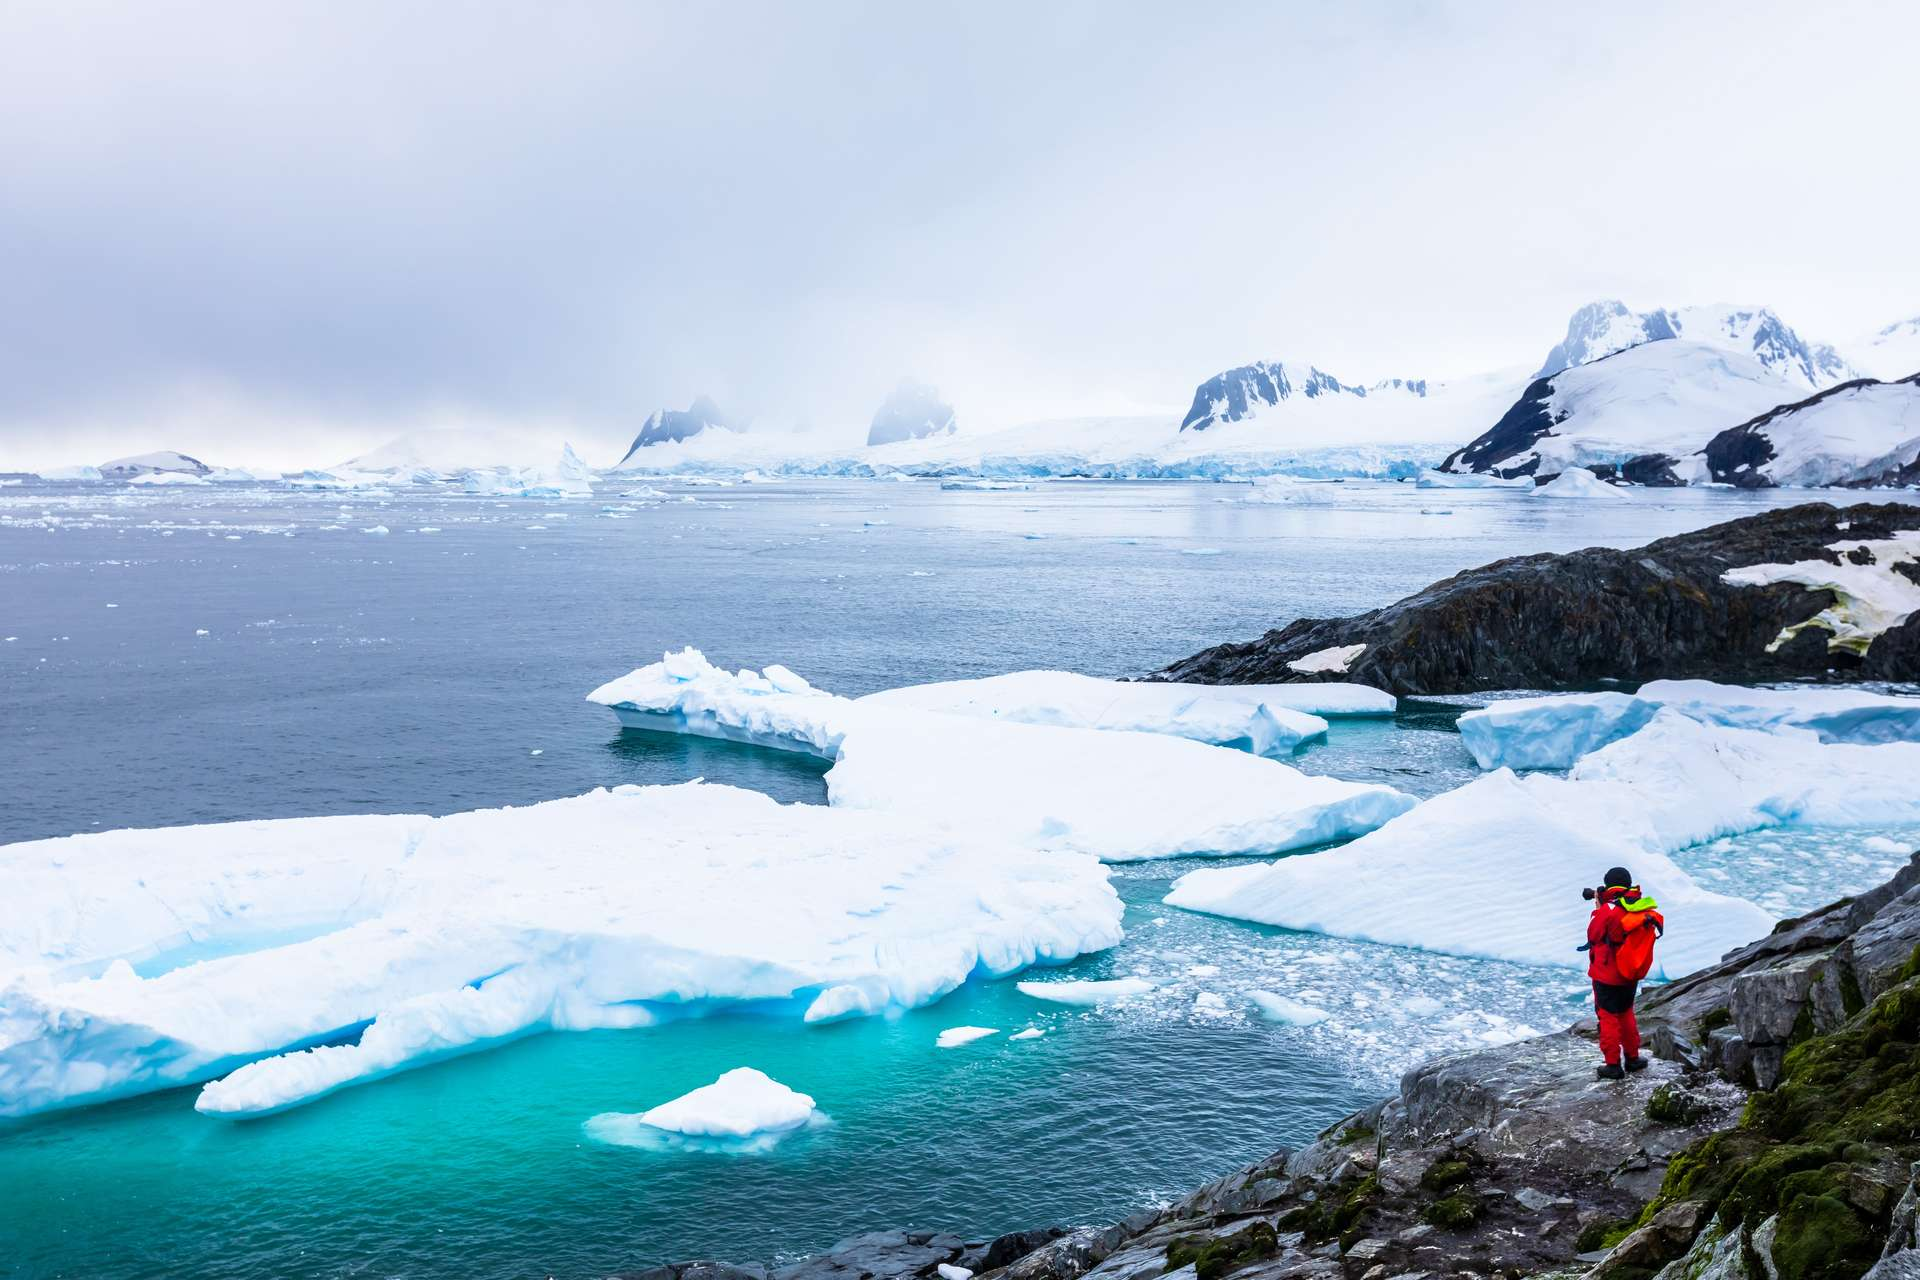 L'Antarctique, situé au pôle Sud de la Terre, est un continent. © NicoElNino, Adobe Stock